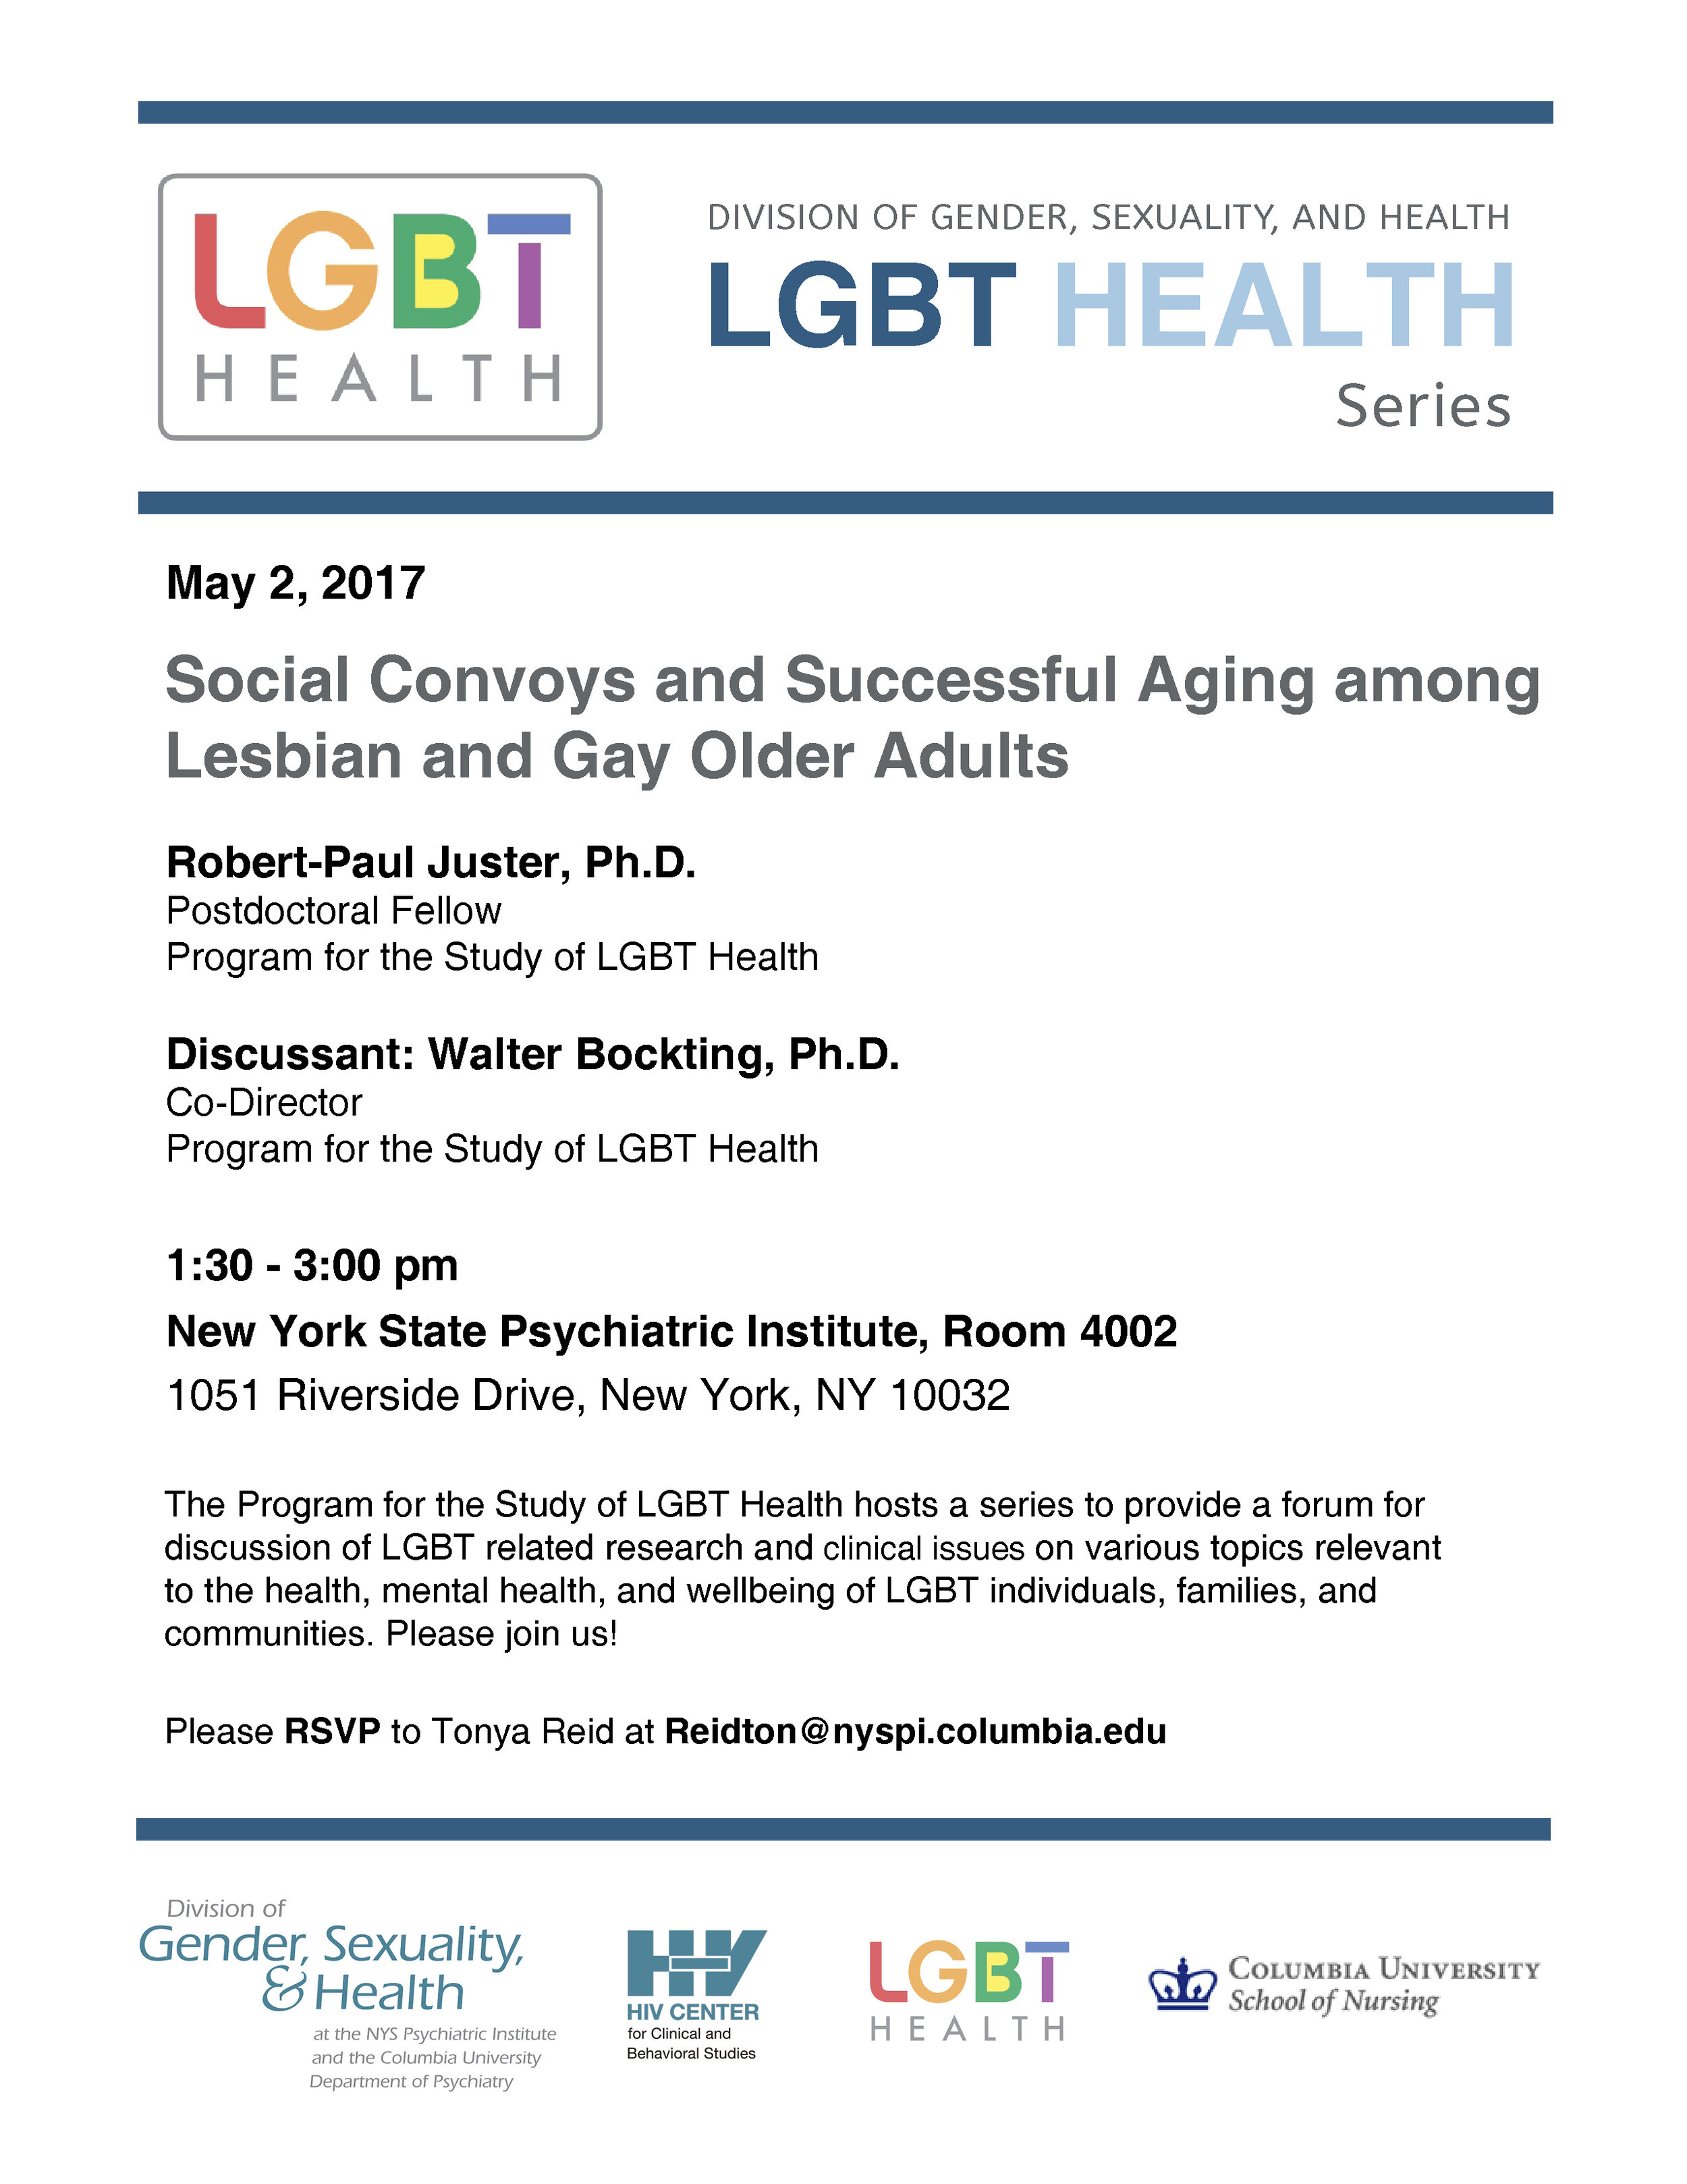 LGBT Health Series May 2 2017.jpg